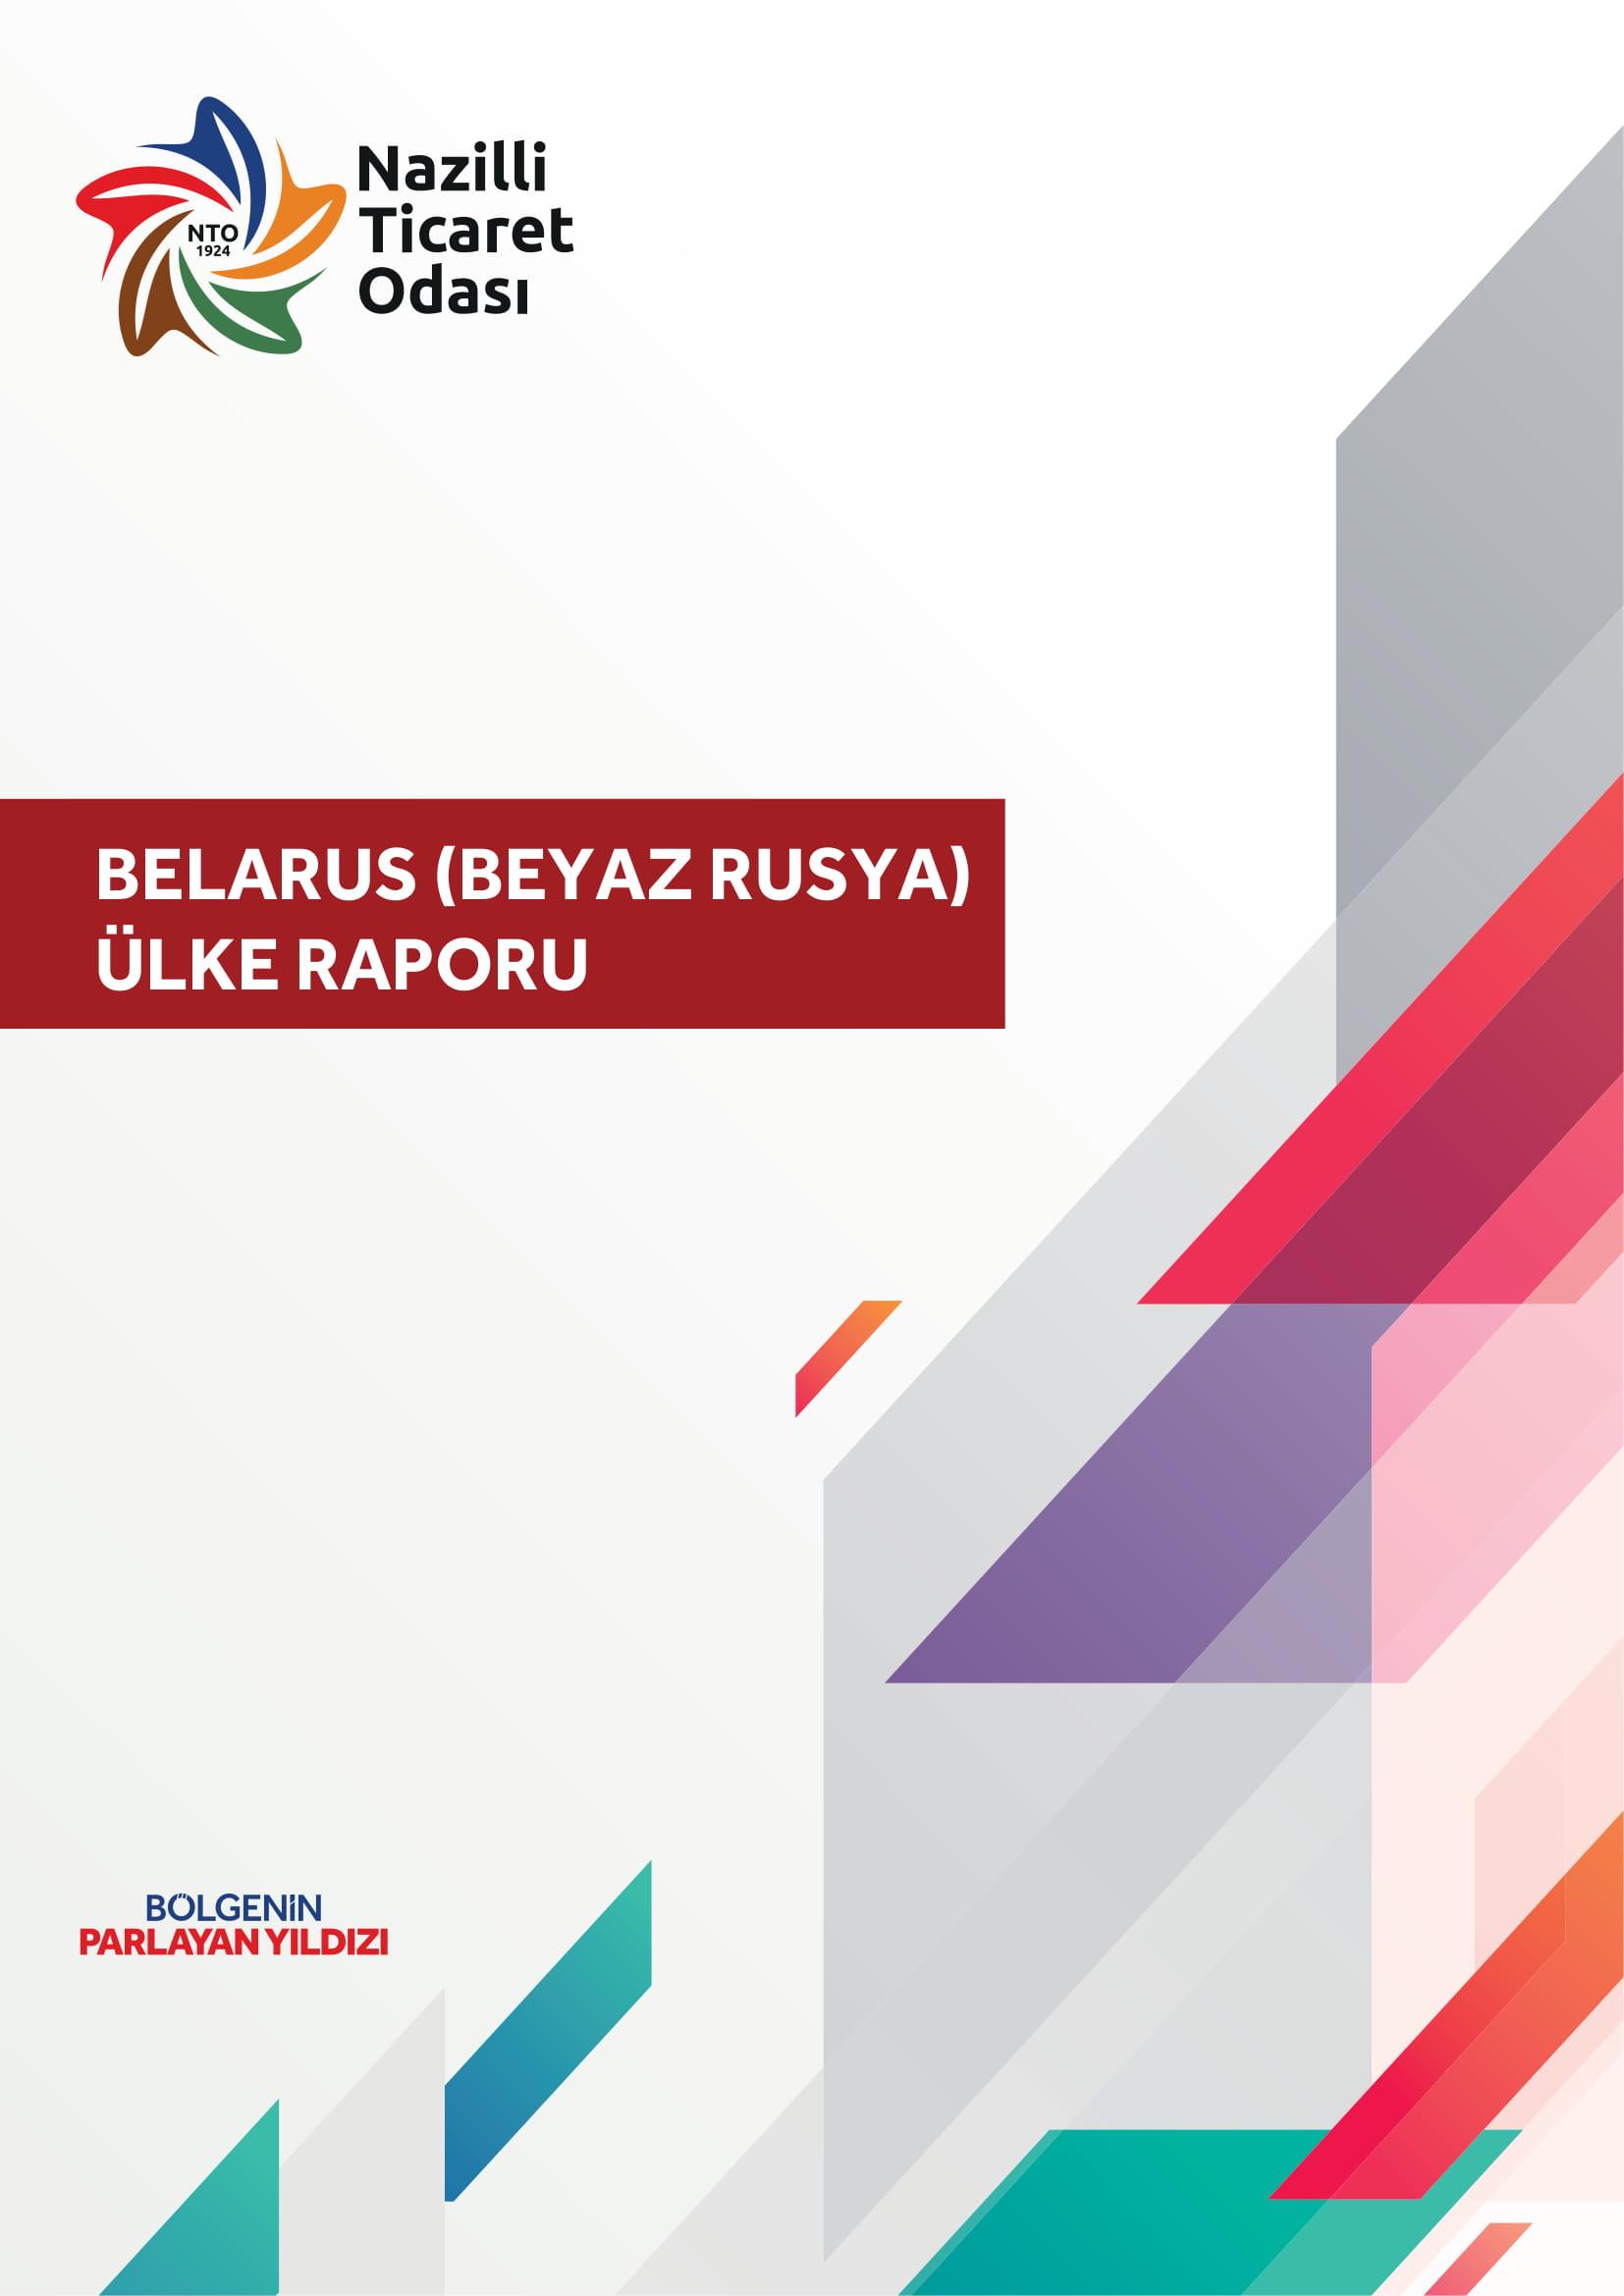 belarus-ulke-raporu-01